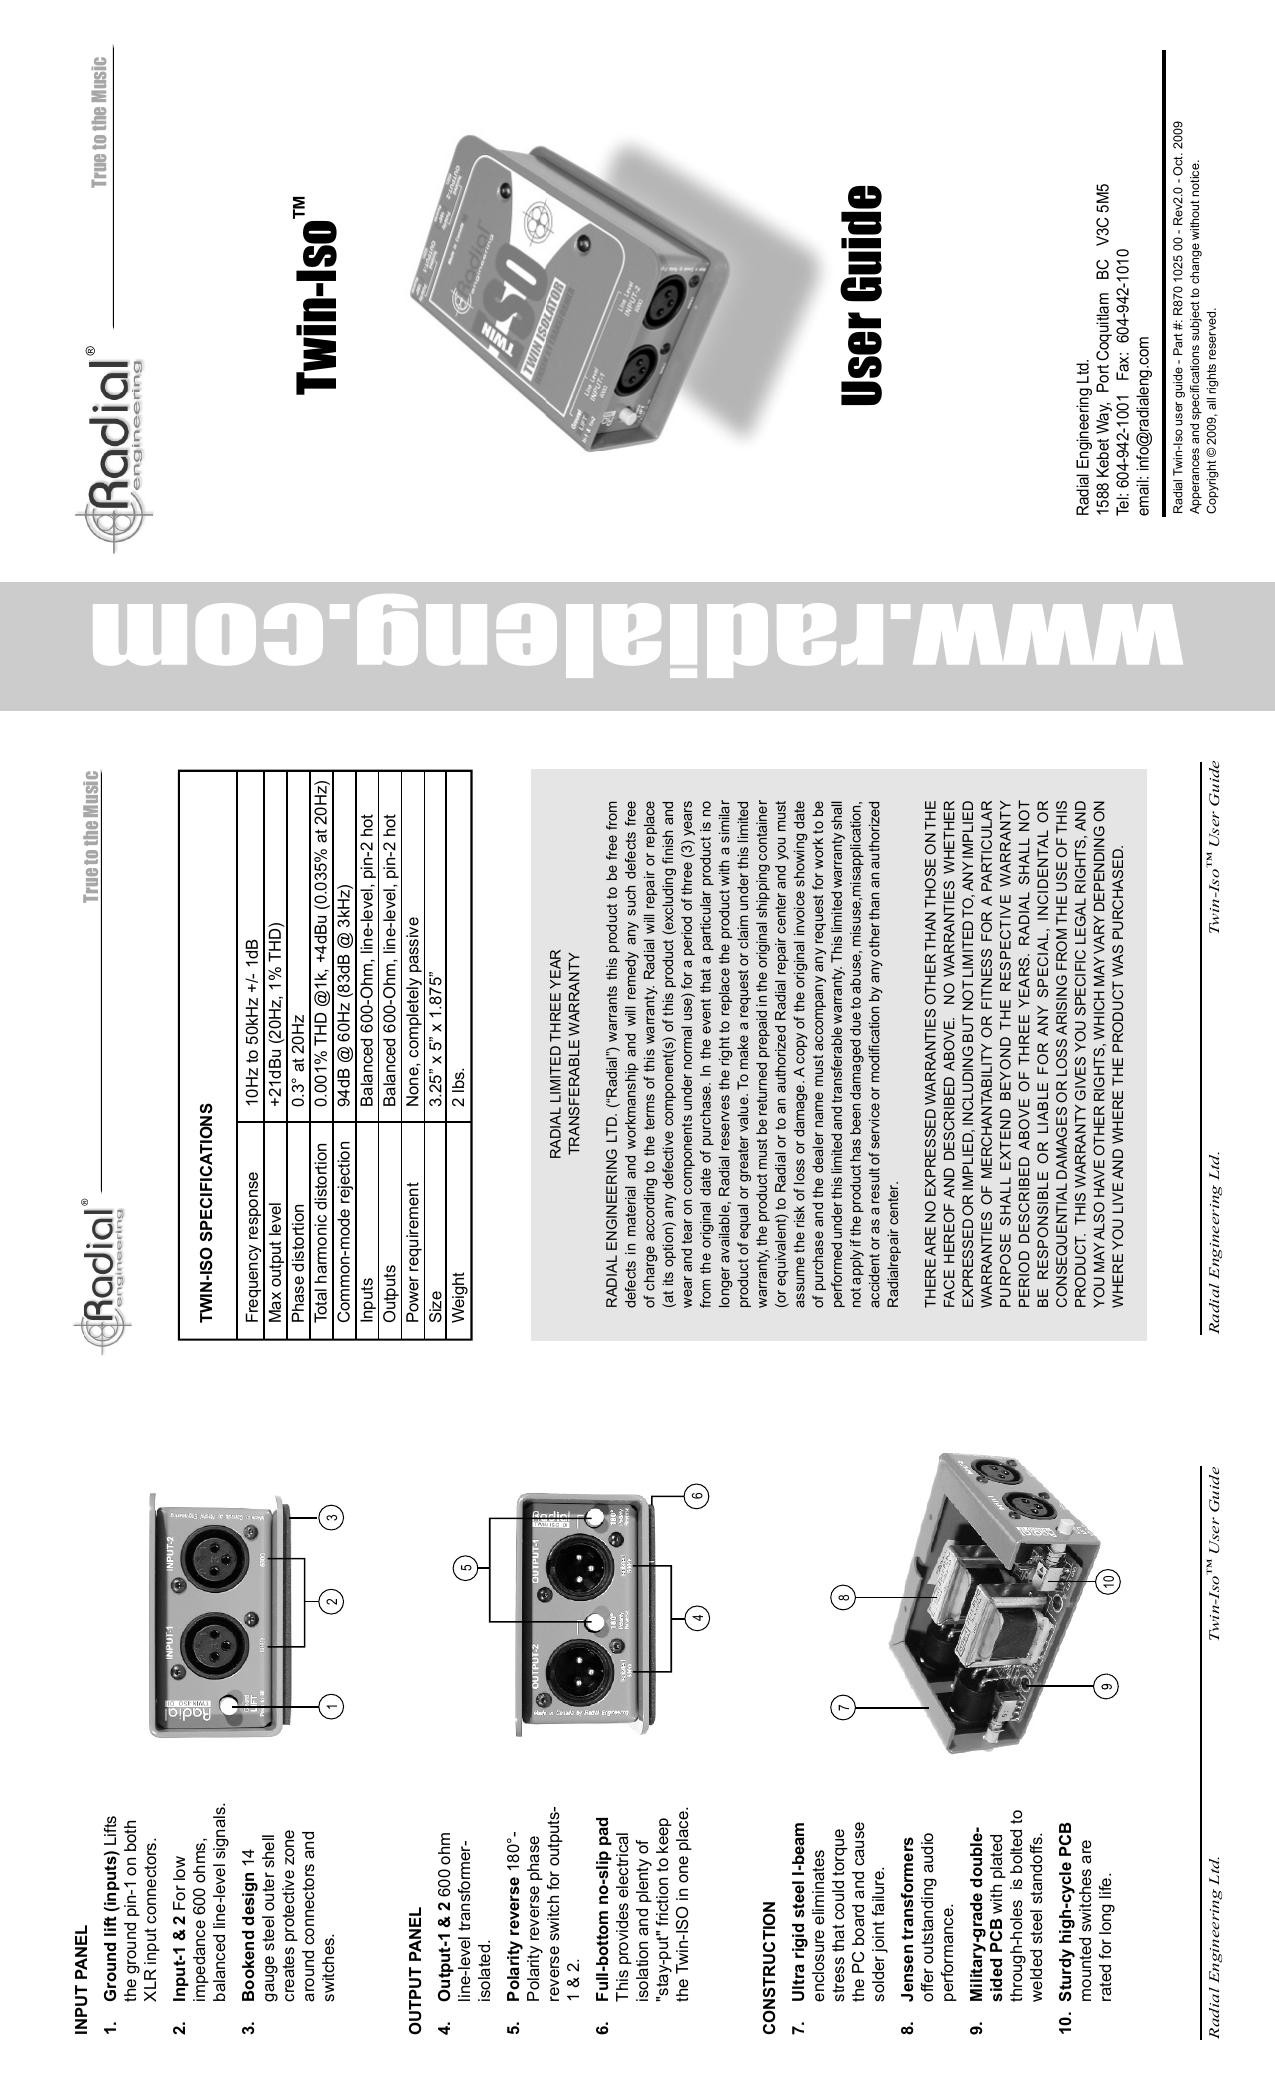 www.radialeng.com - Radial Engineering | manualzz.com